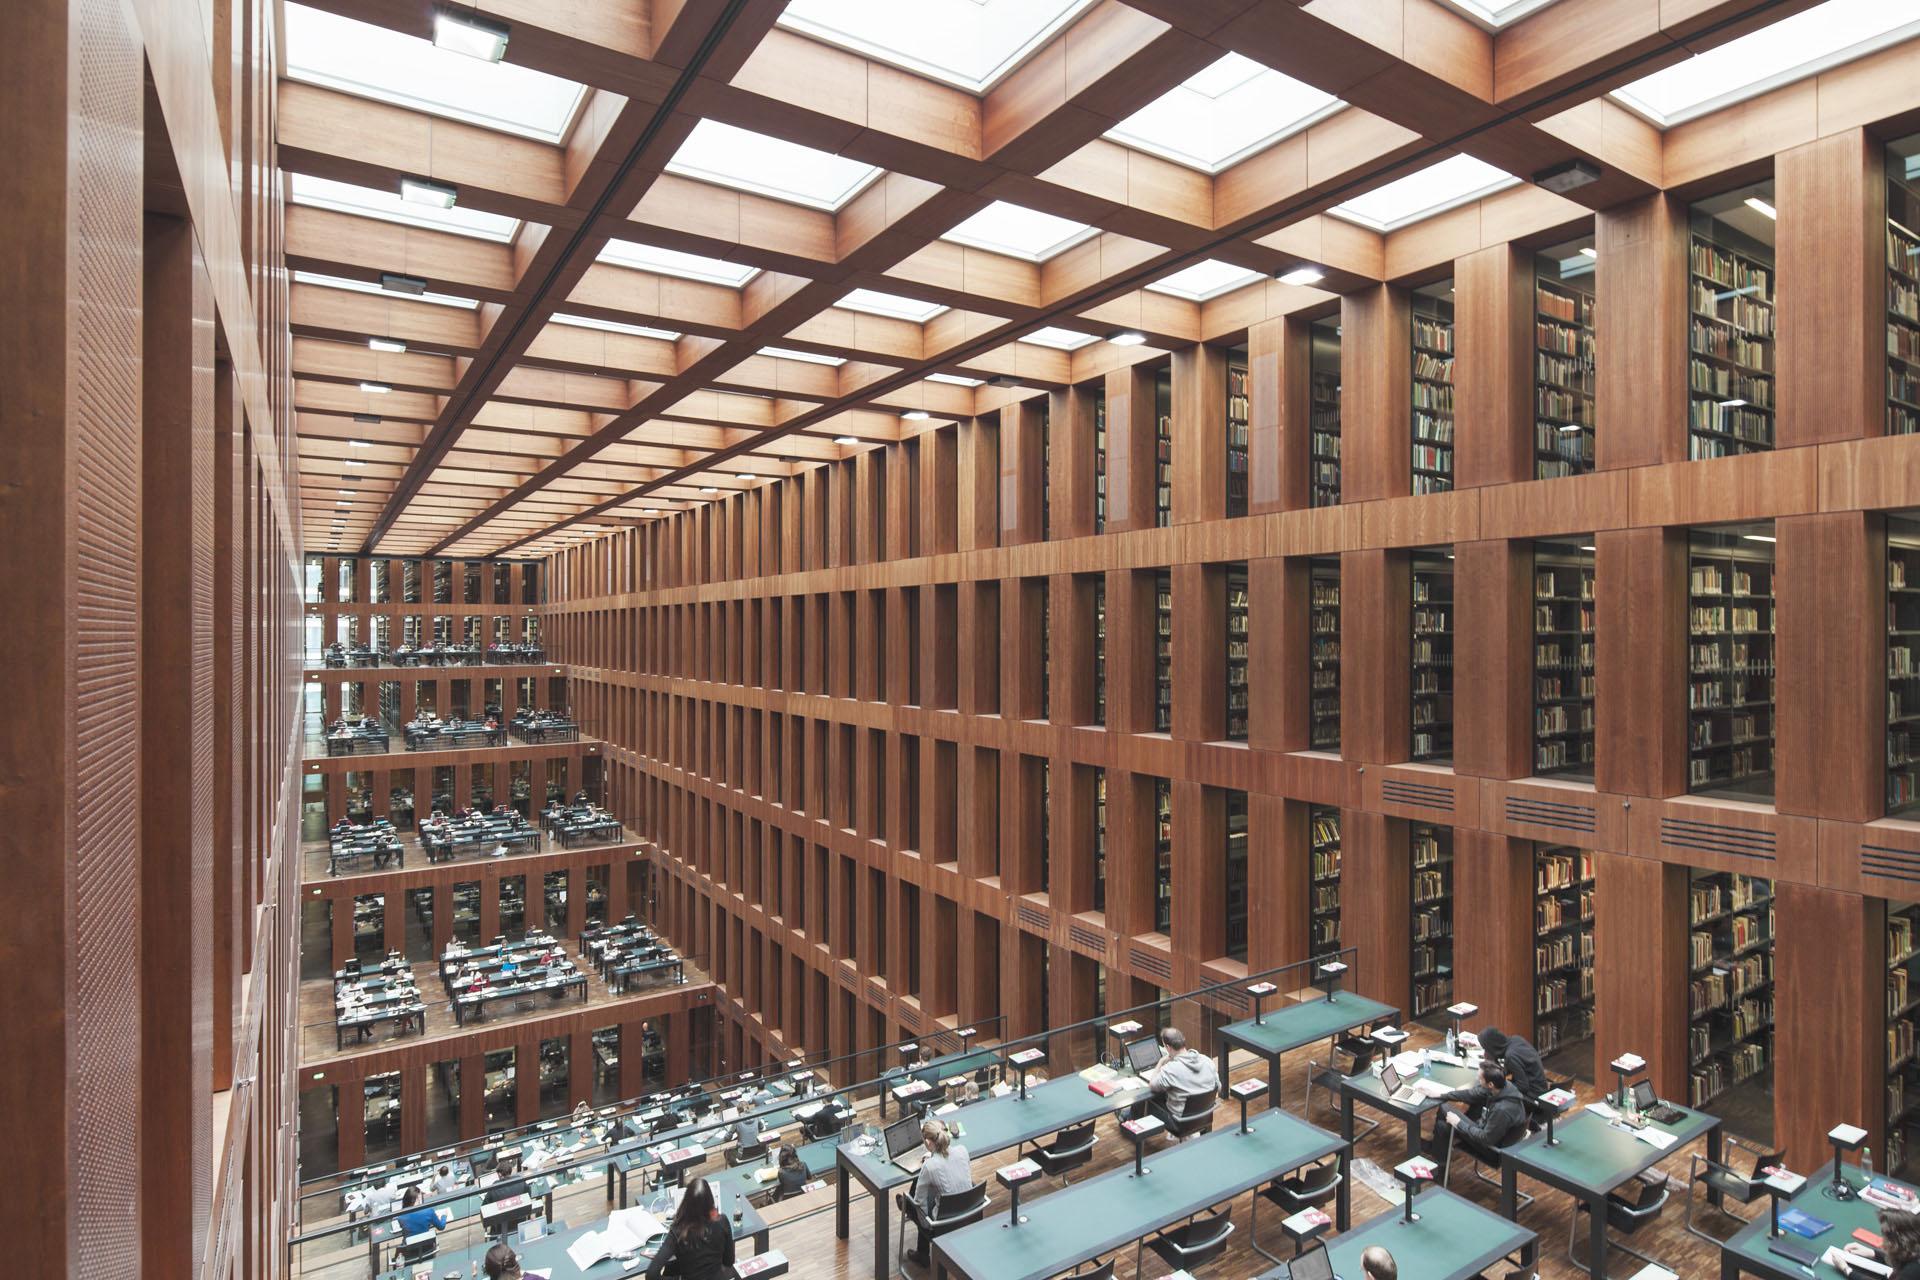 MG 0005x - Grimm Bibliothek Berlin